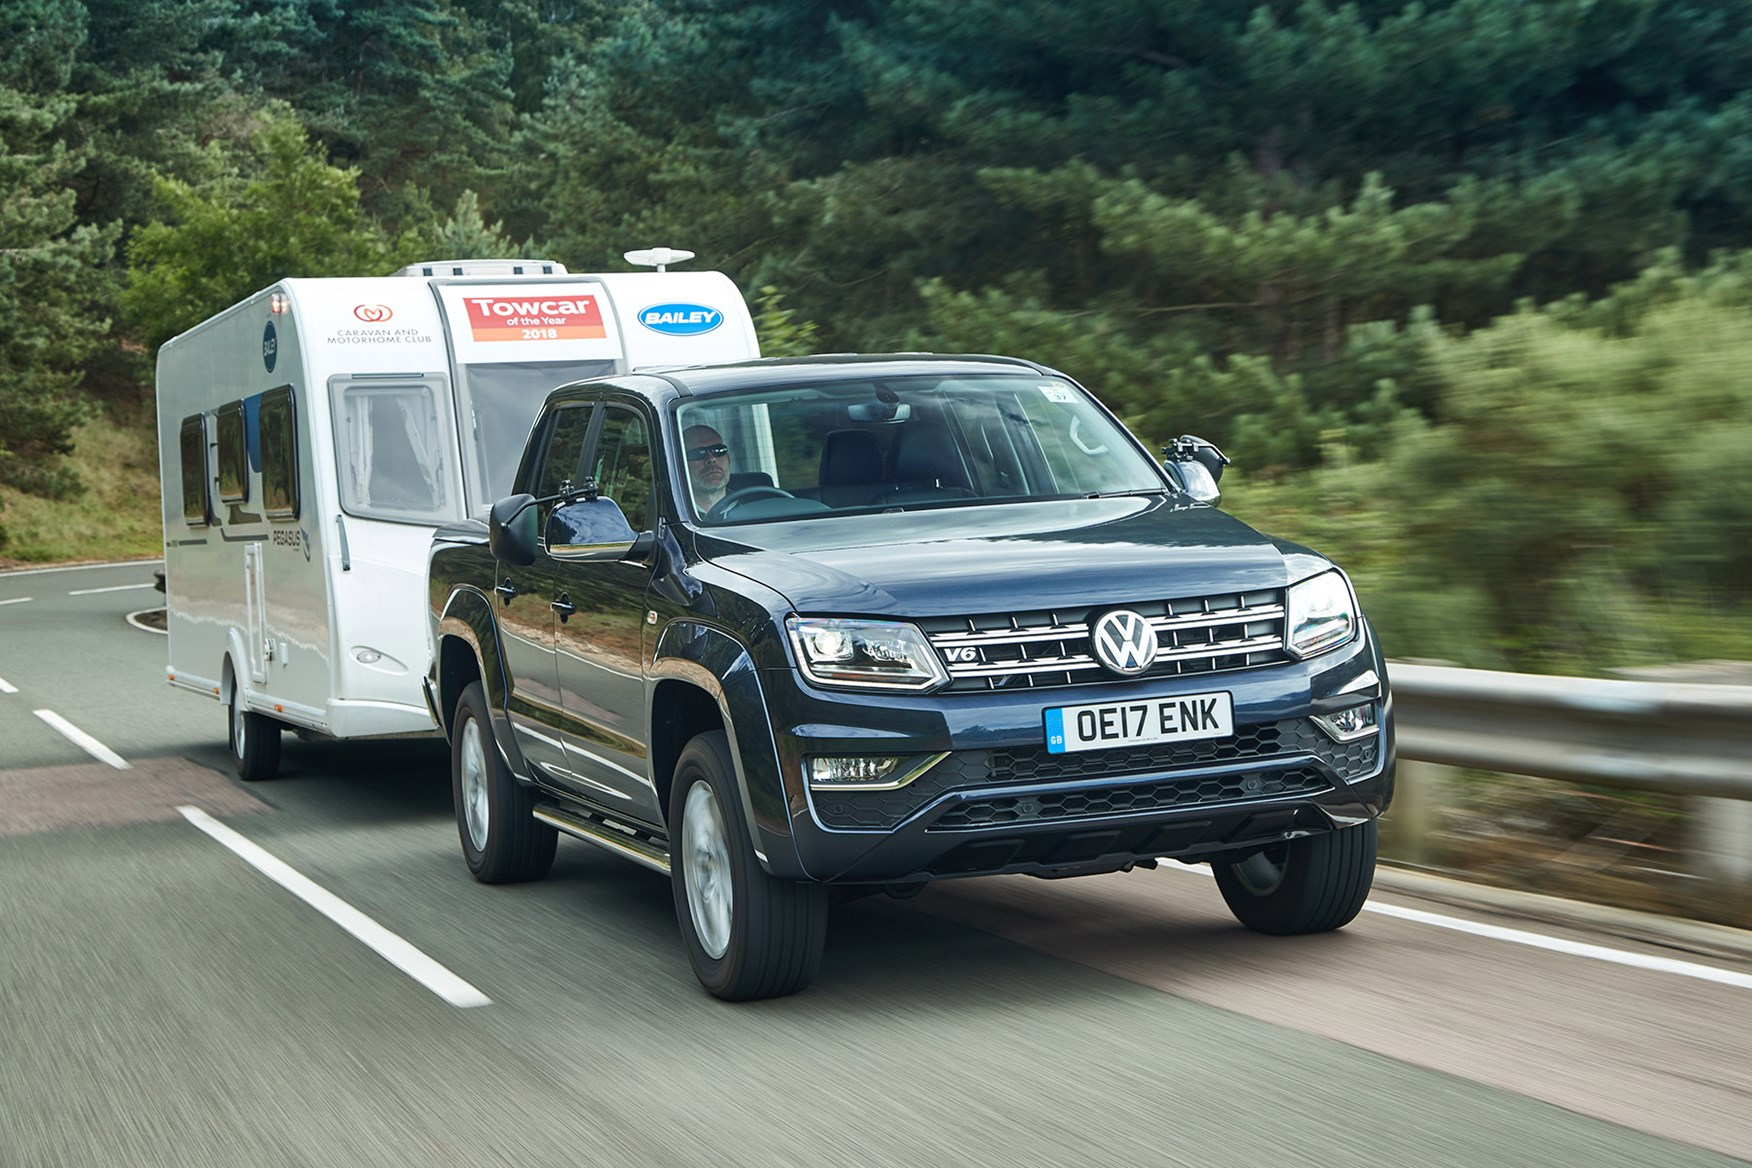 VW Amarok towing capacity - towing a caravan